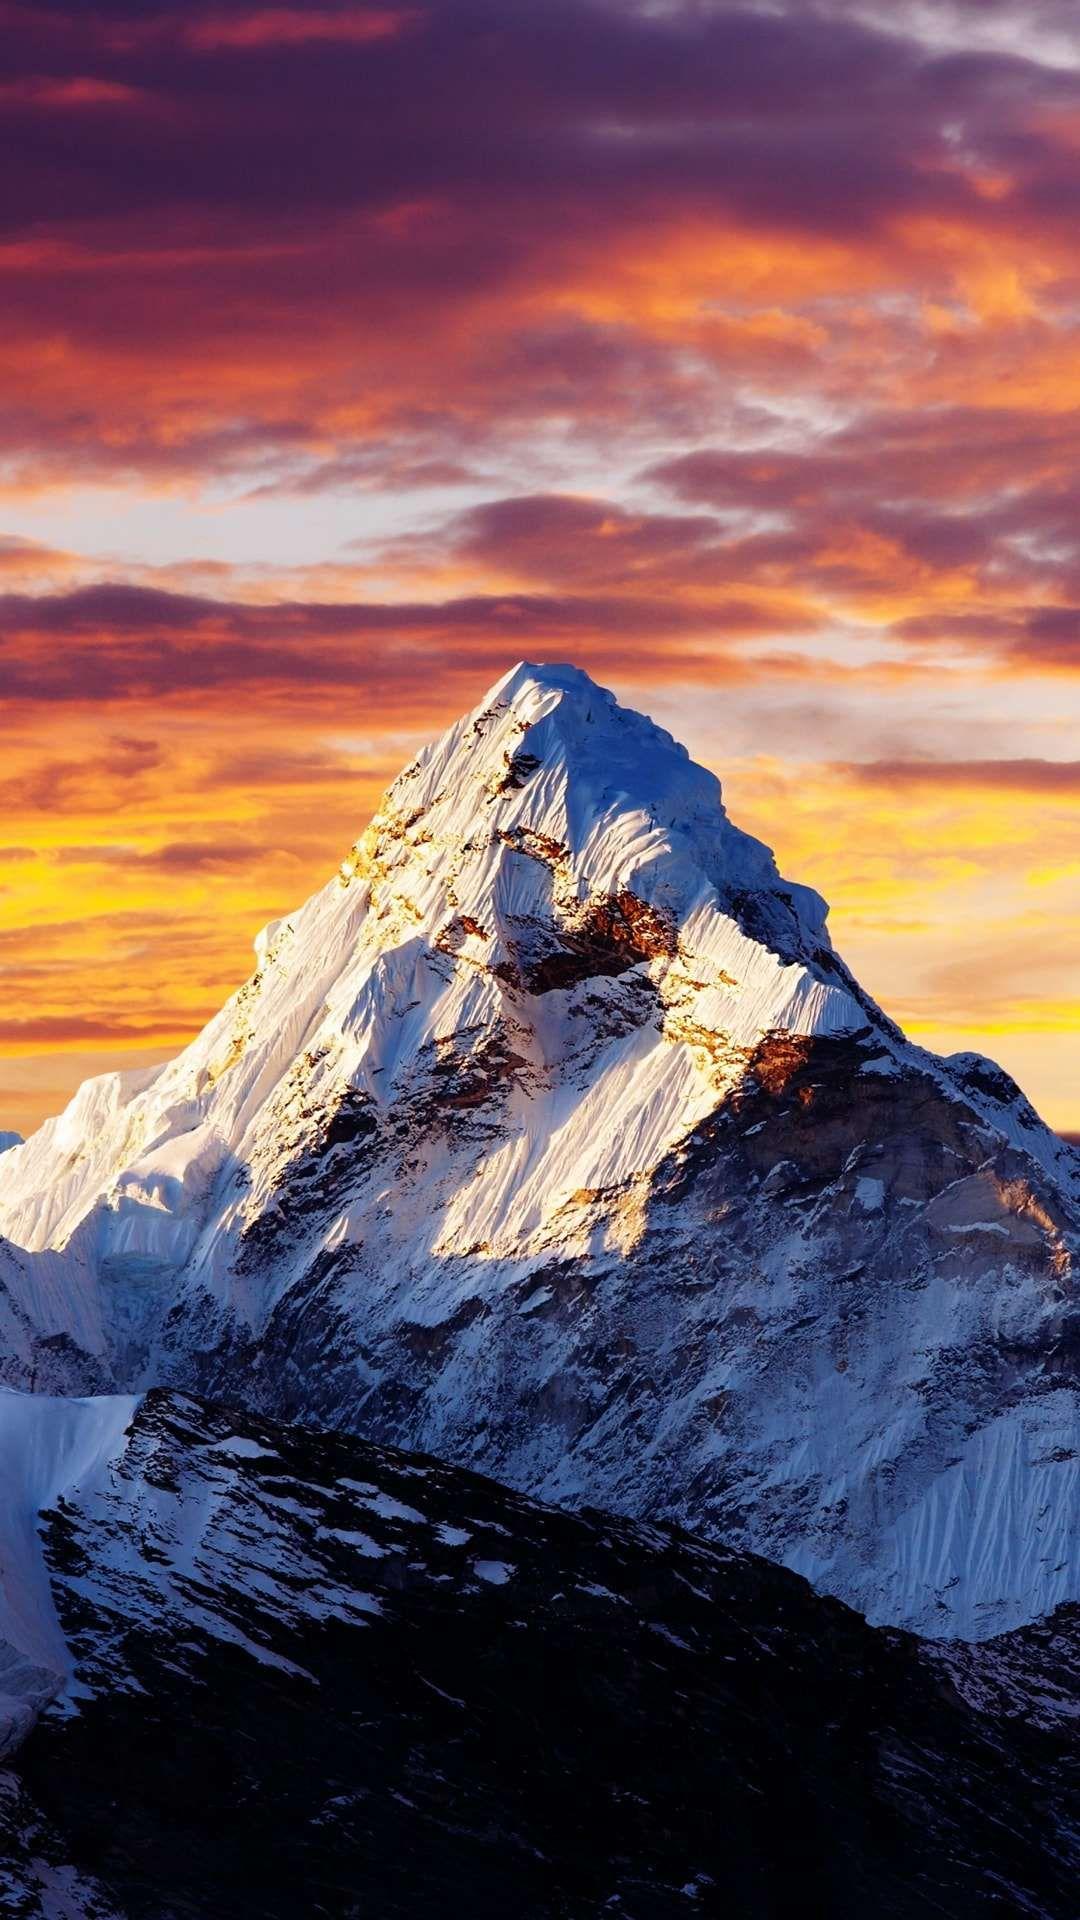 Alps Snow Mountain Sunset Clouds iPhone Wallpaper Landscape 1080x1920